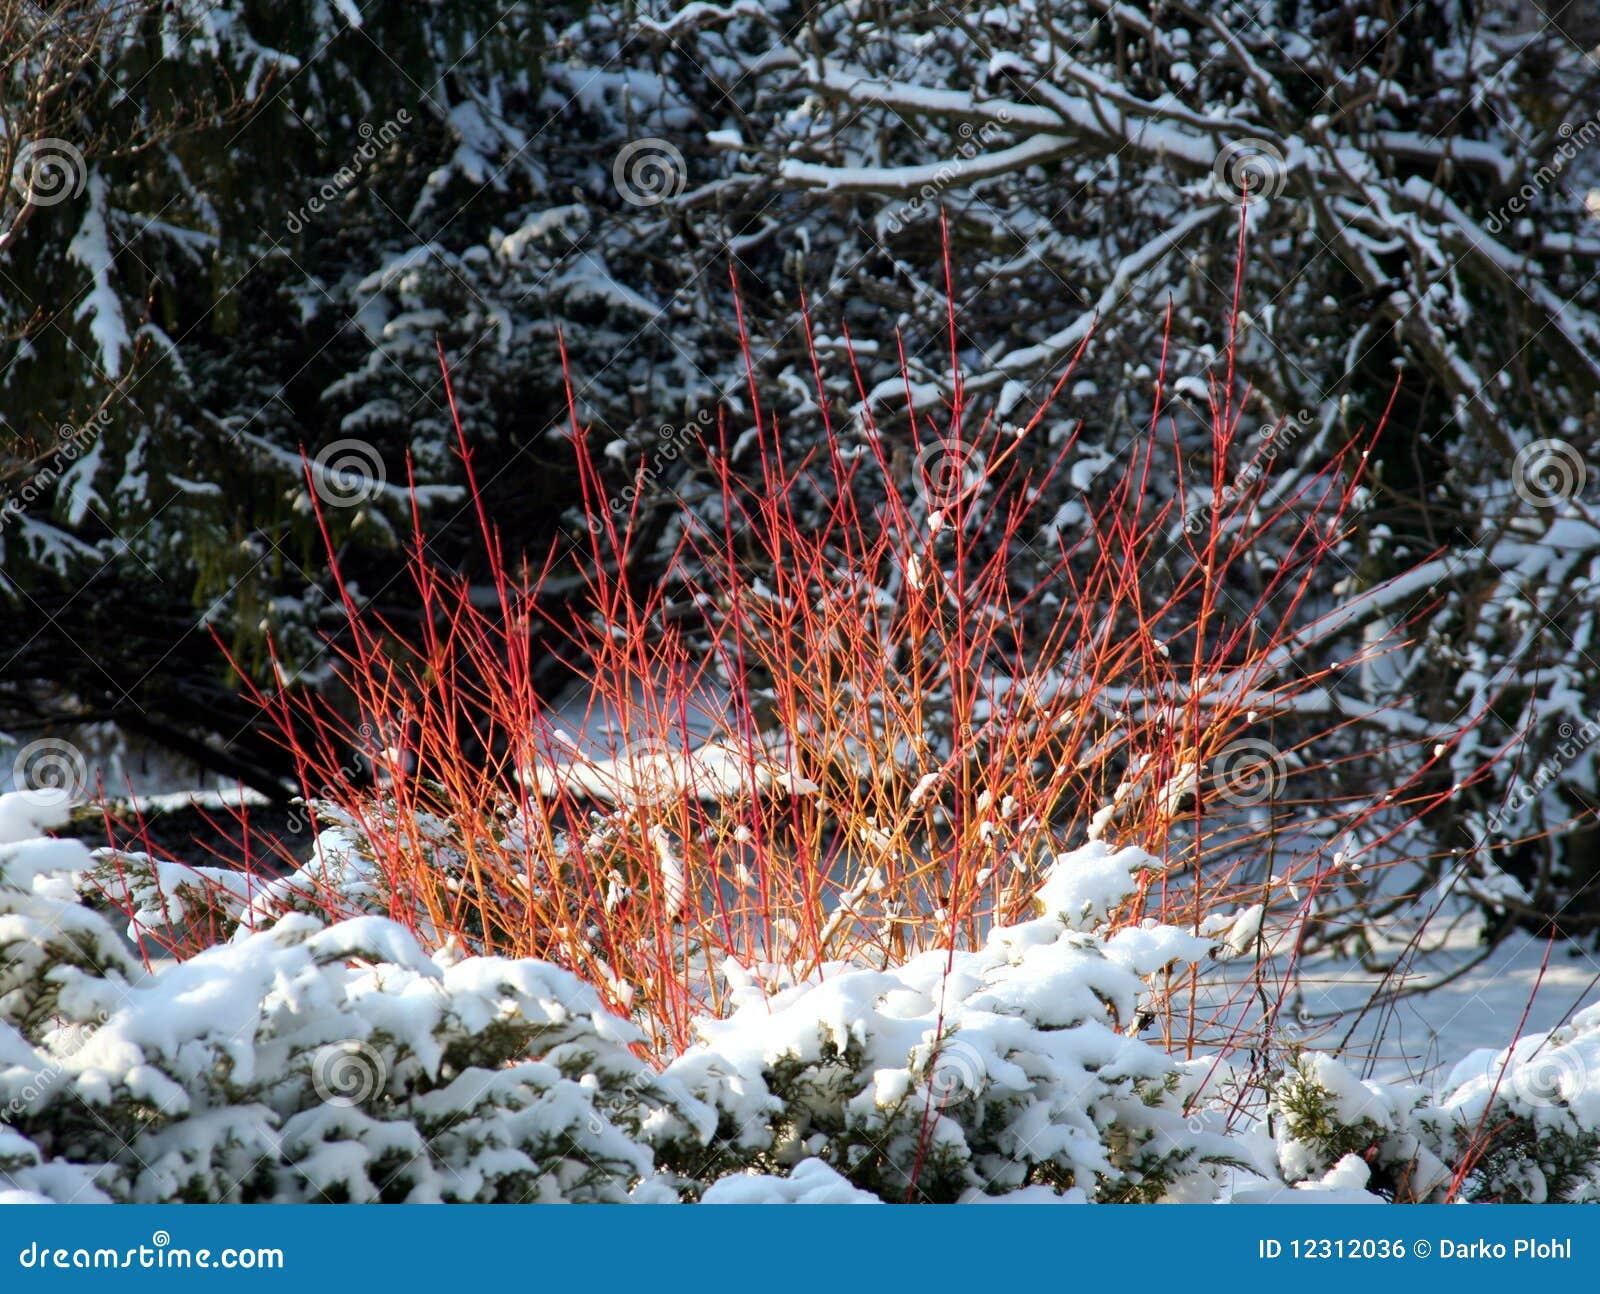 Cornus Or Dogwood In Winter Time Stock Photo Image Of